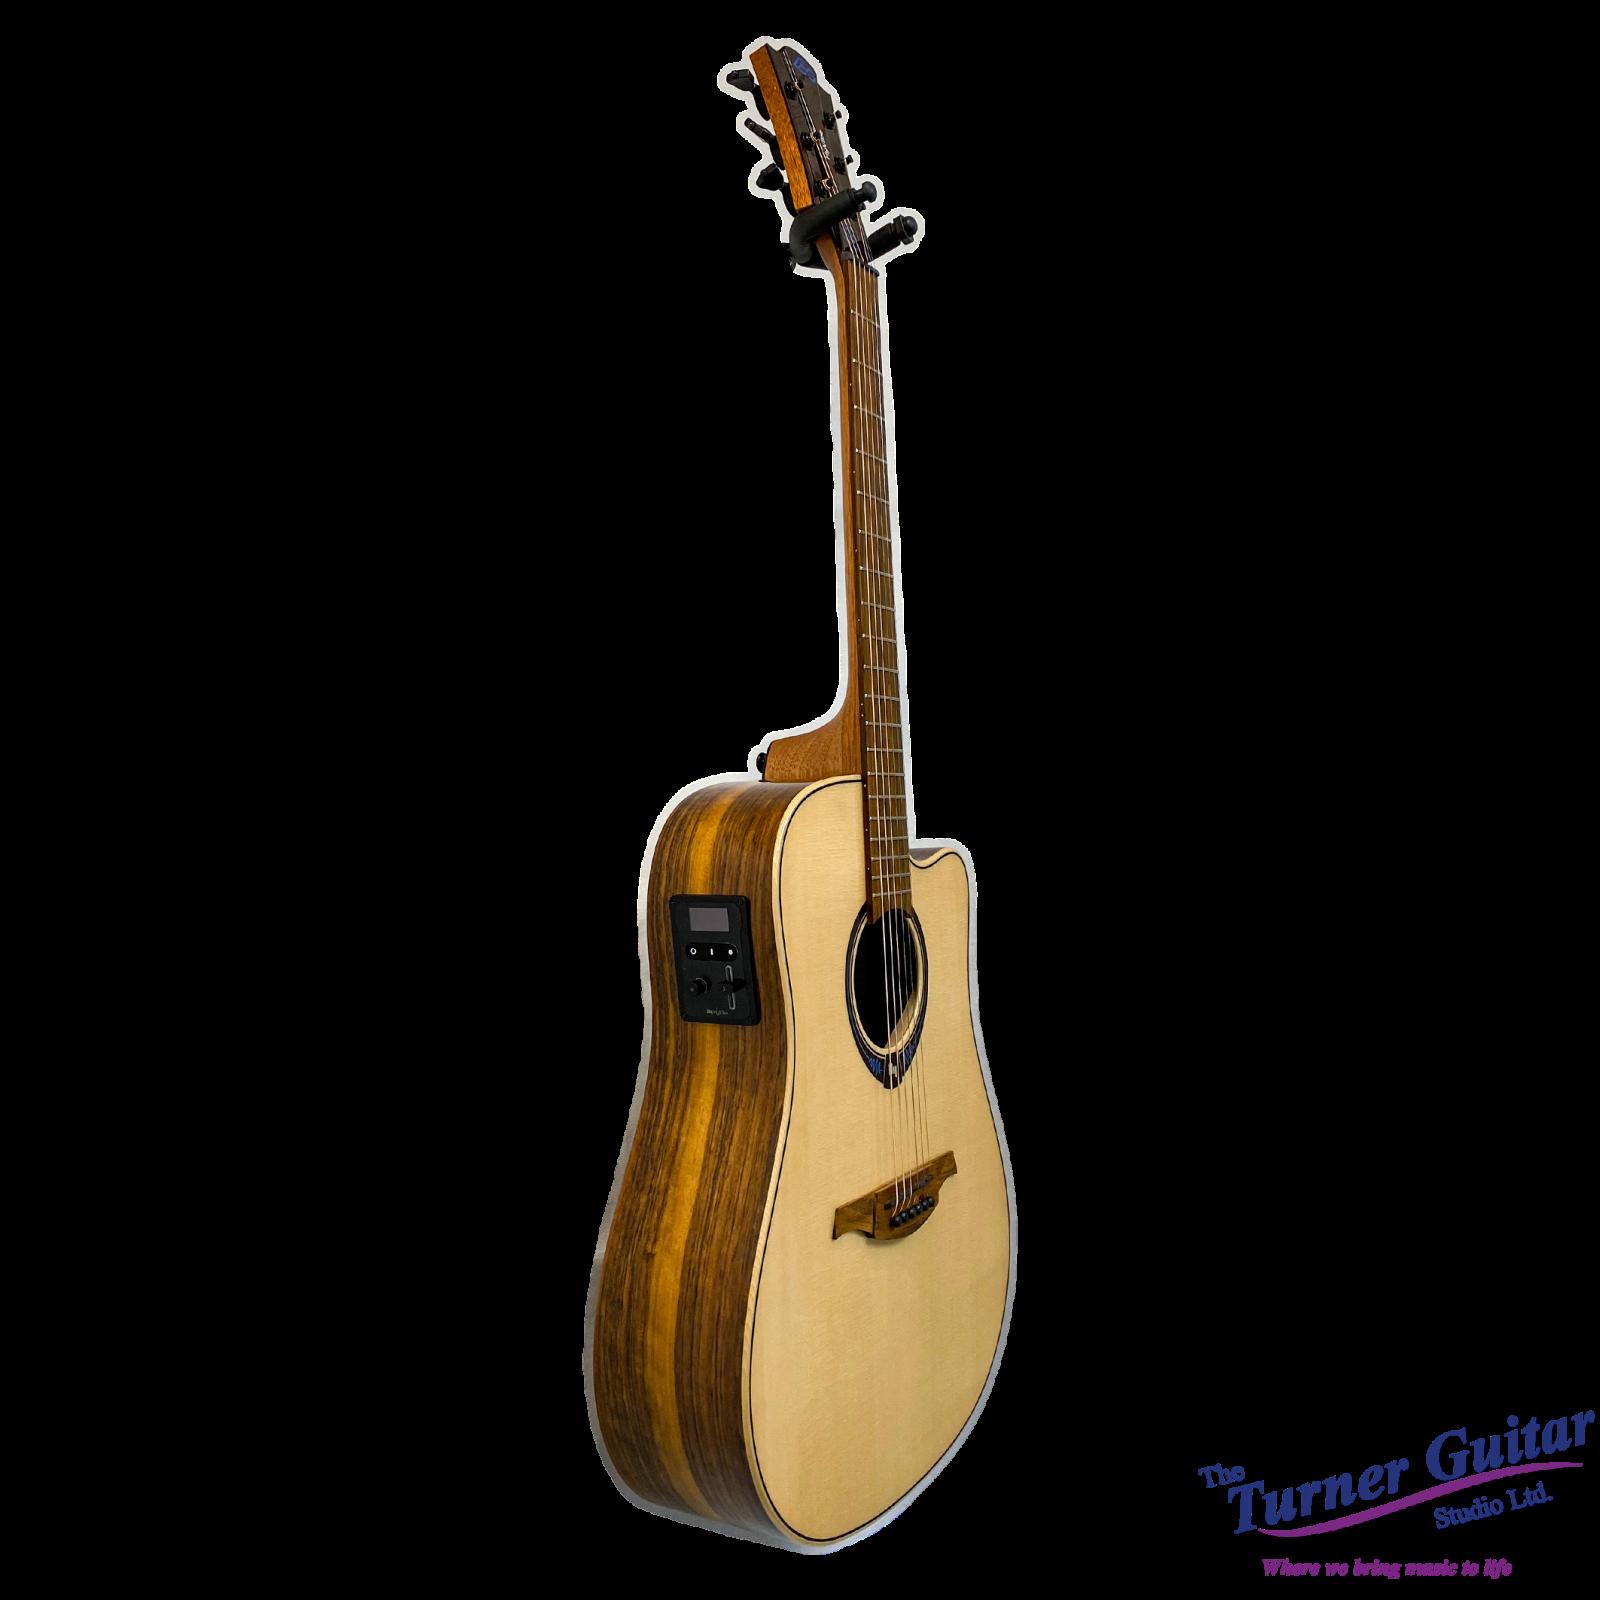 Lag Guitars Tramontane Hyvibe 20 Glossy Engelmann Spruce Top Smart Guitar Bluetooth Effects 3700166366374